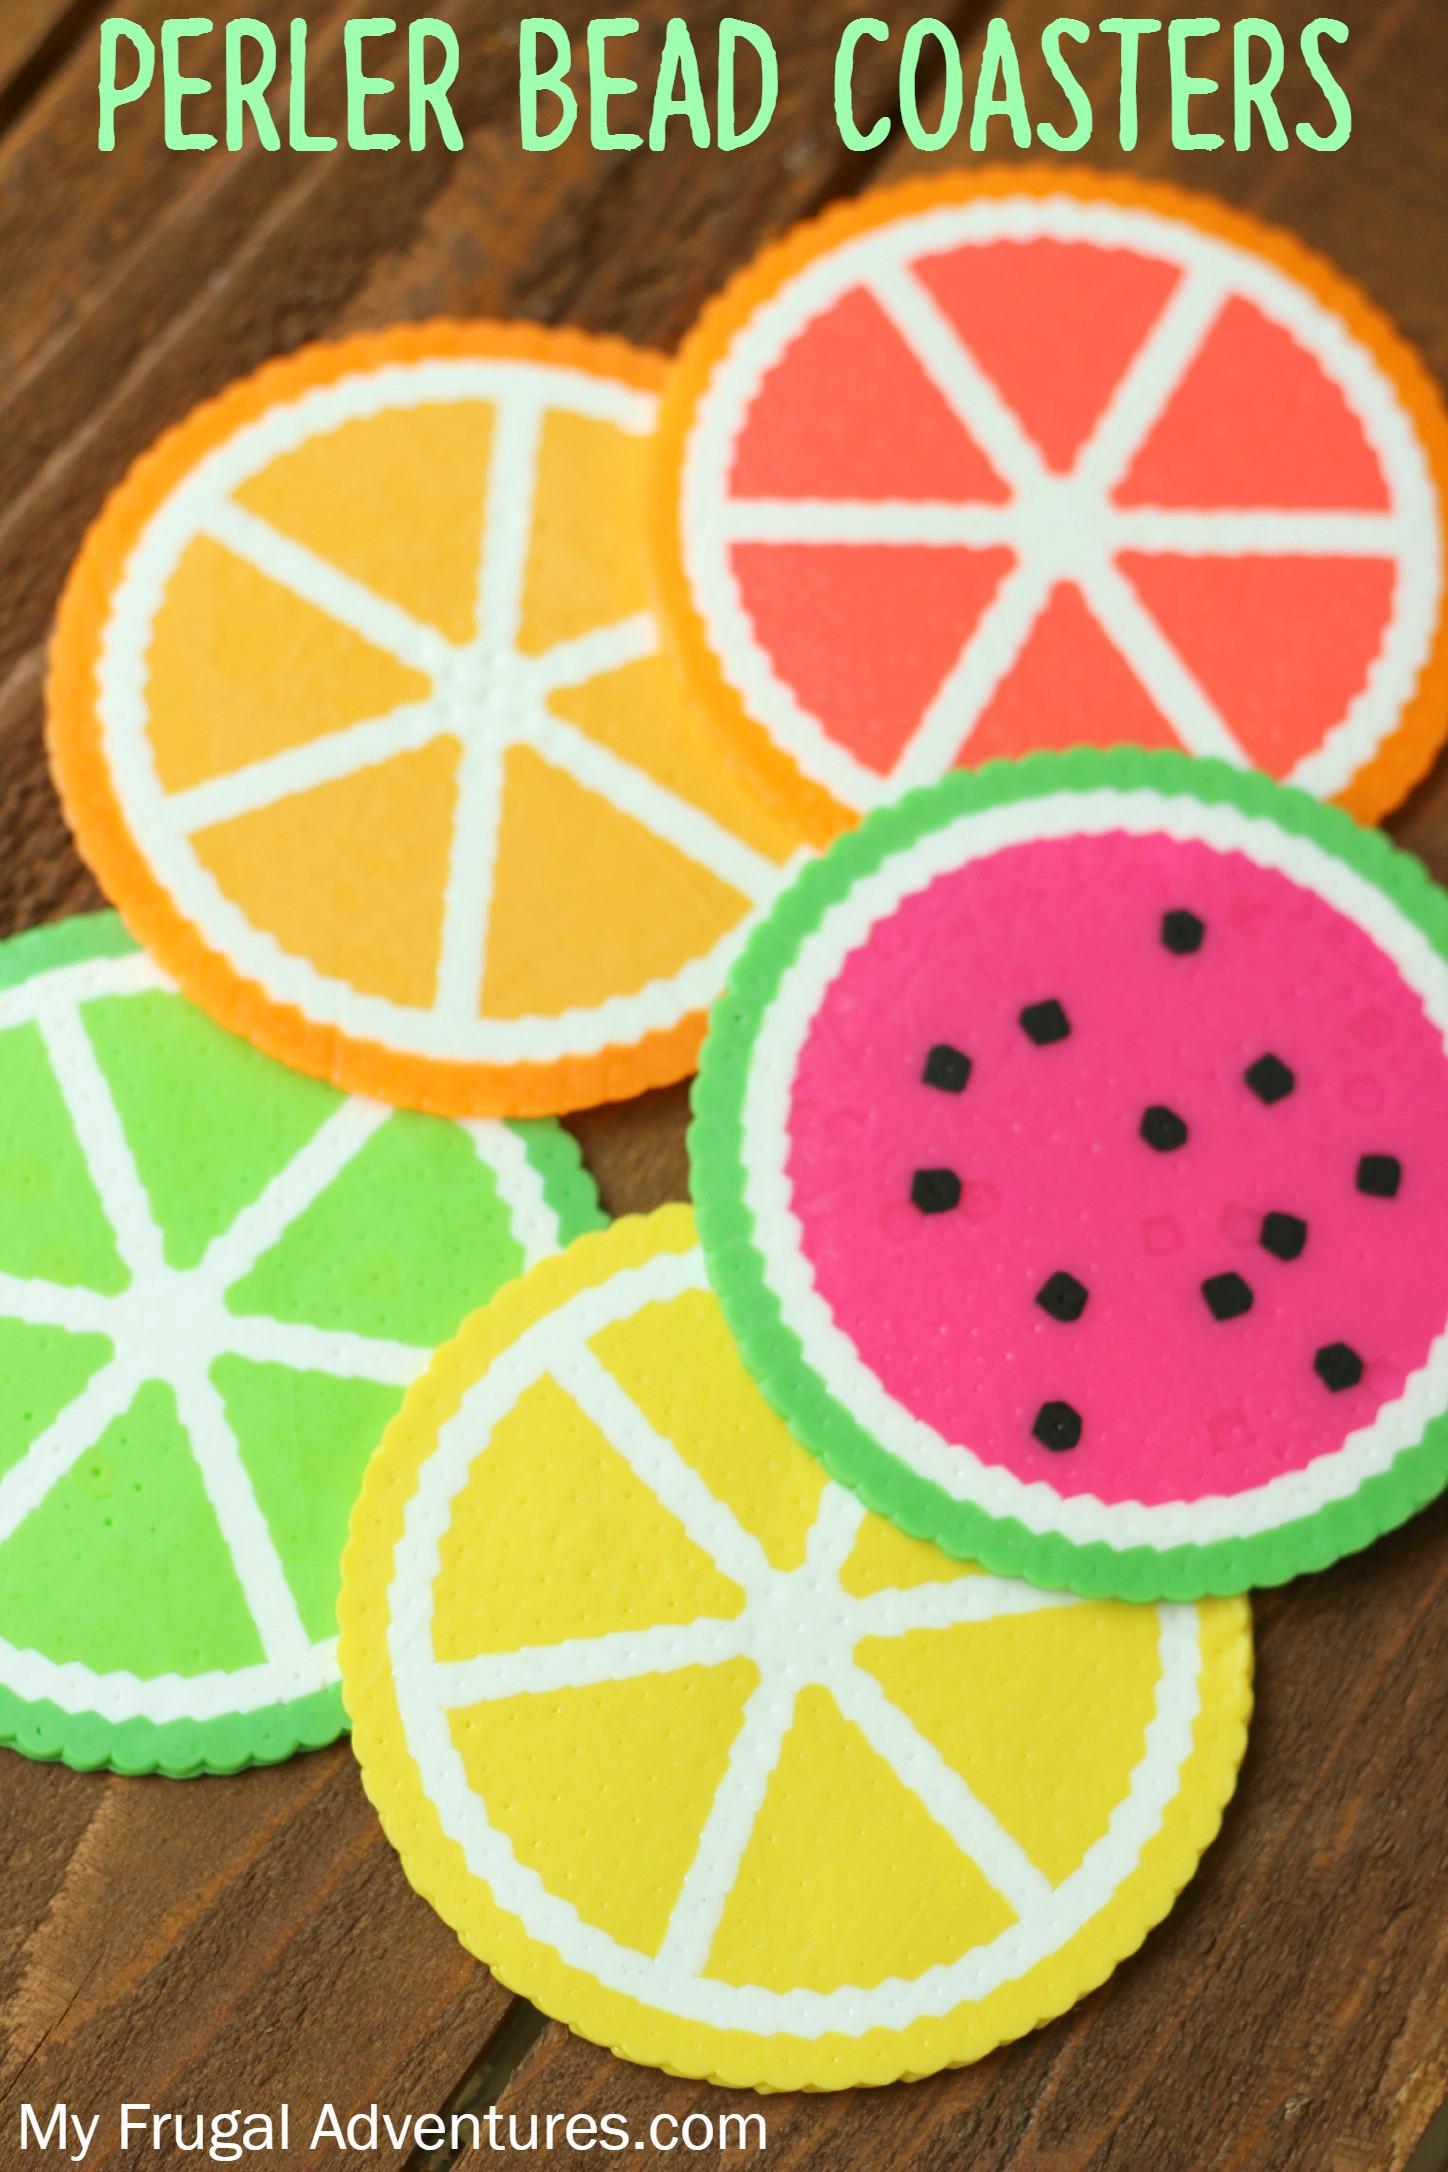 Citrus Perler Bead Coasters My Frugal